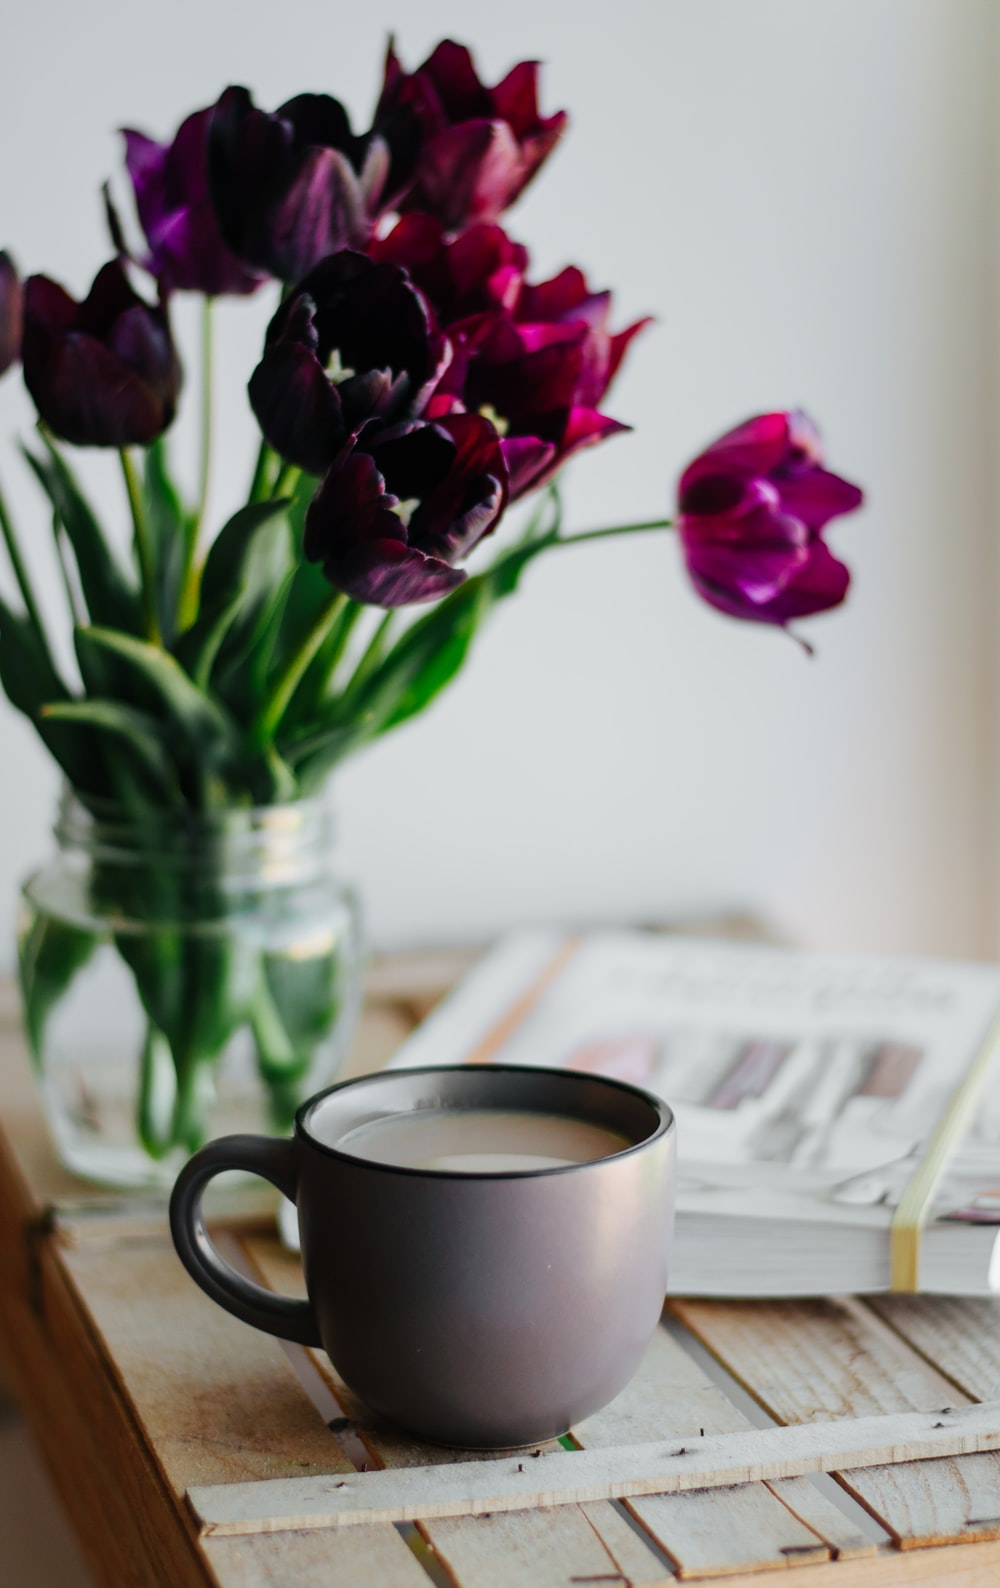 cup near tulip flowers